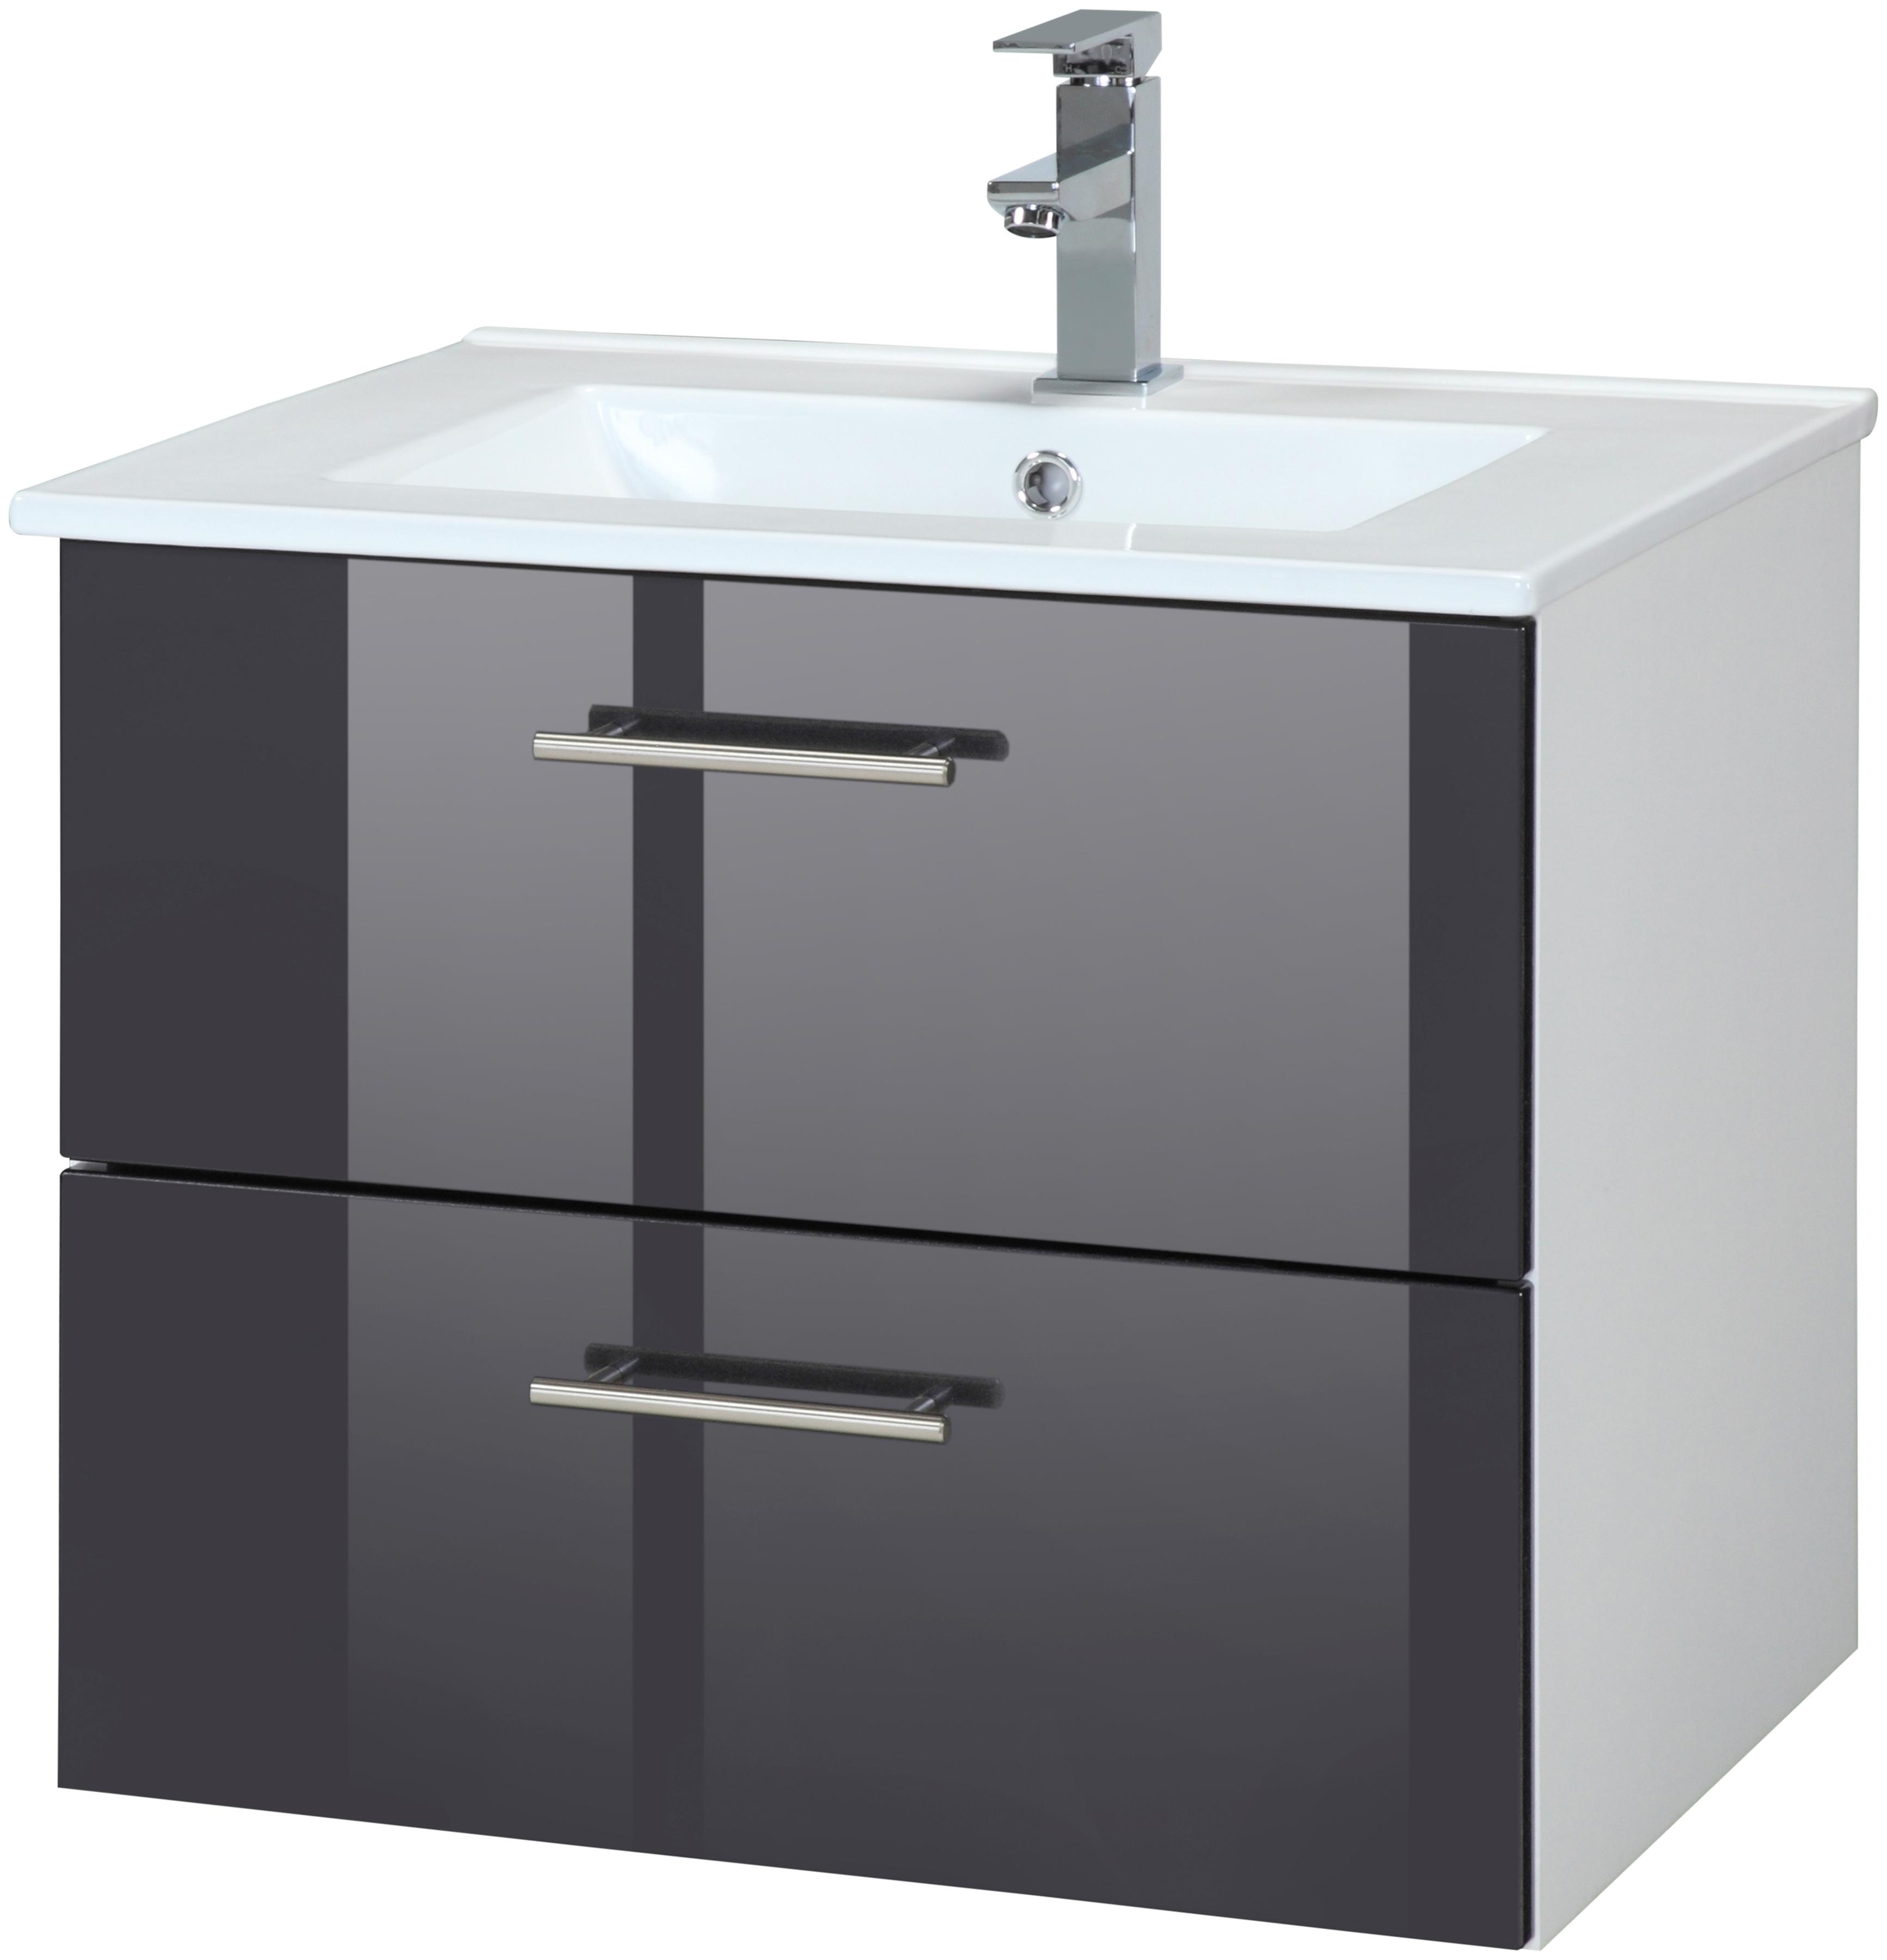 schwarz stahl badm bel sets online kaufen m bel suchmaschine. Black Bedroom Furniture Sets. Home Design Ideas